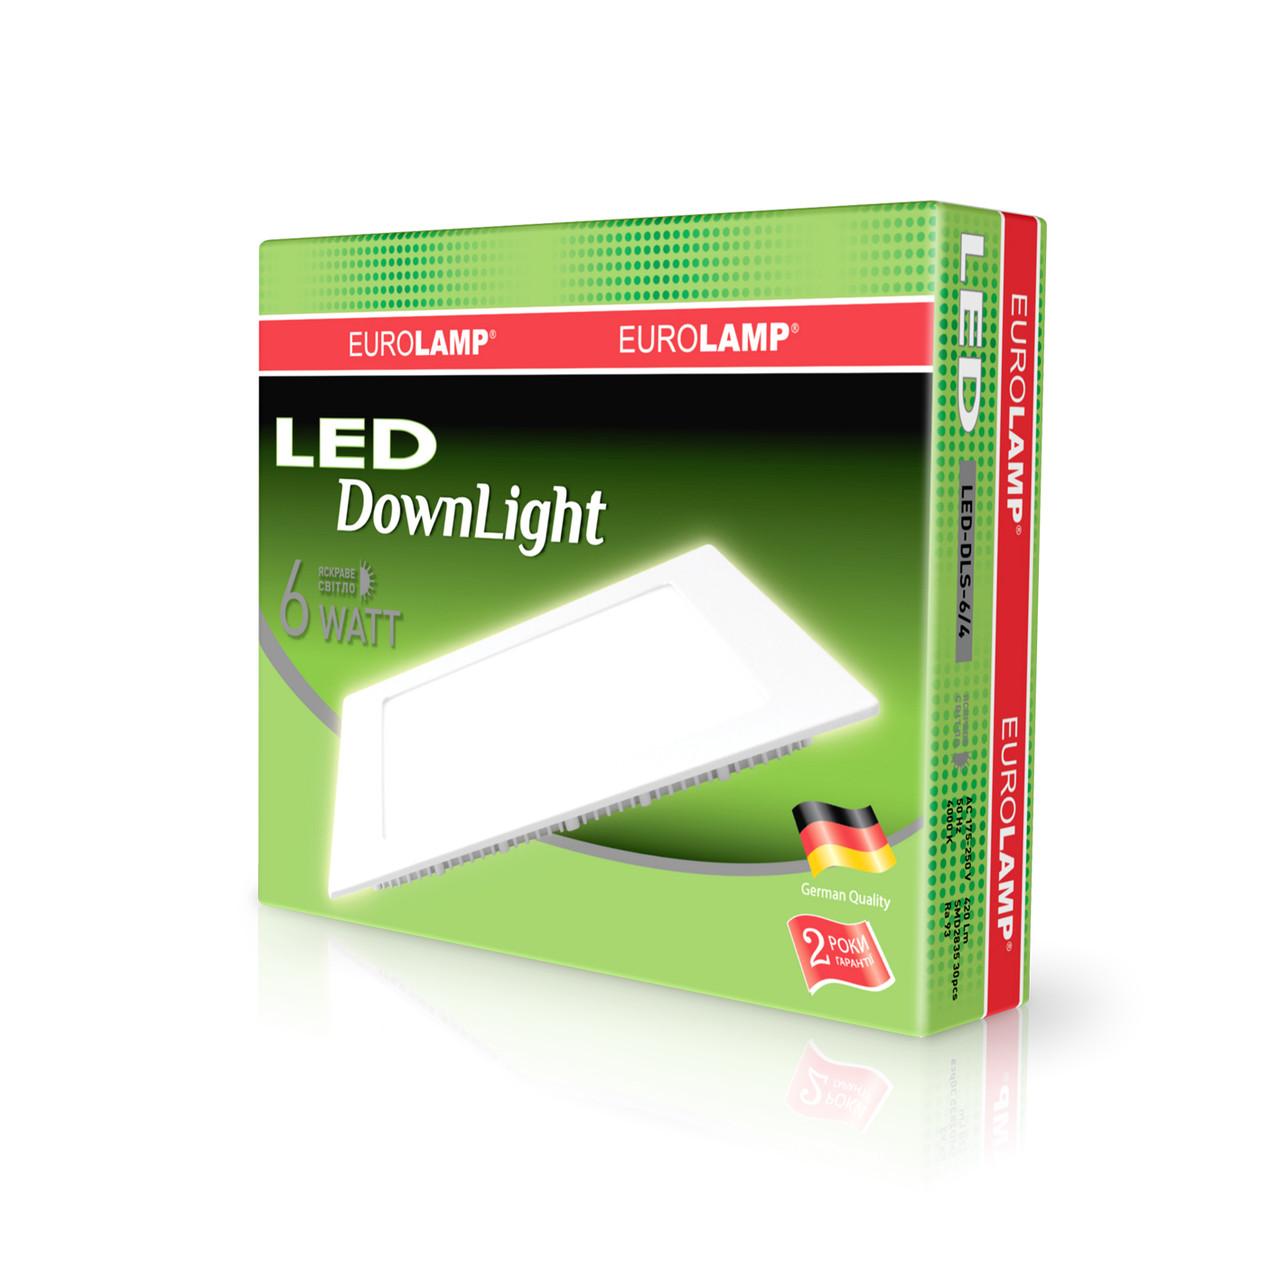 EUROLAMP LED Светильник квадратный Downlight 6W 4000K 220V